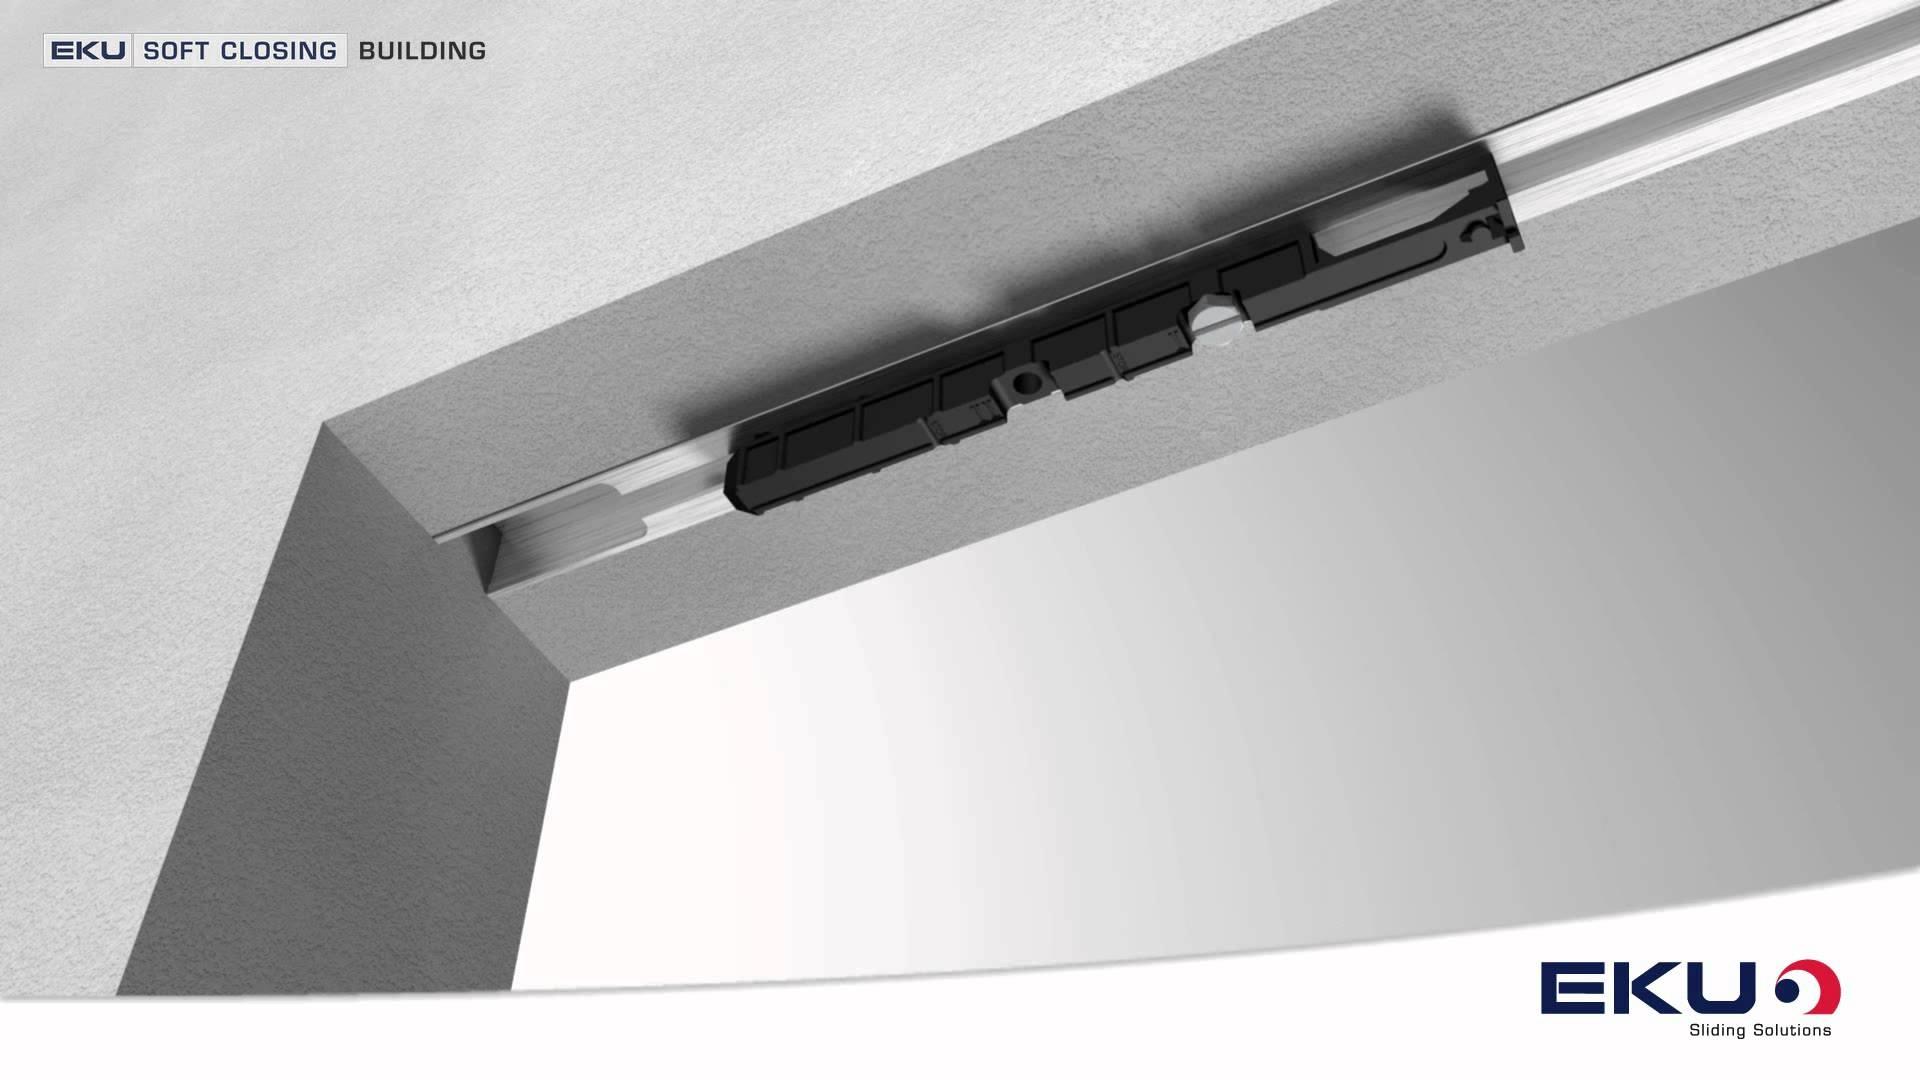 Hafele Pocket Door Slide Systemhafele installation guide soft closing sliding hardware eku